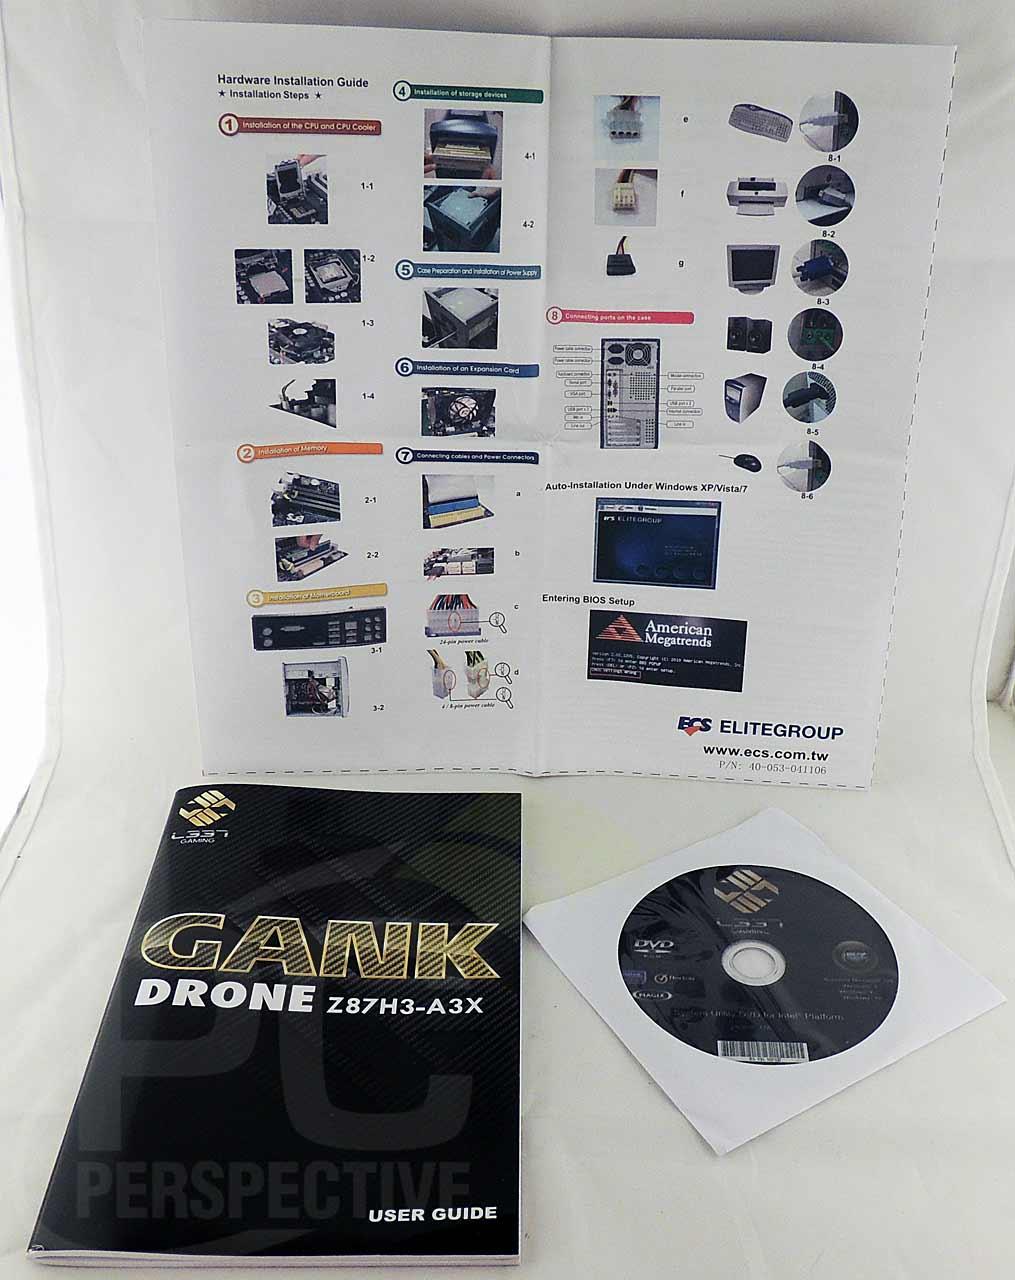 08-manuals-cd.jpg